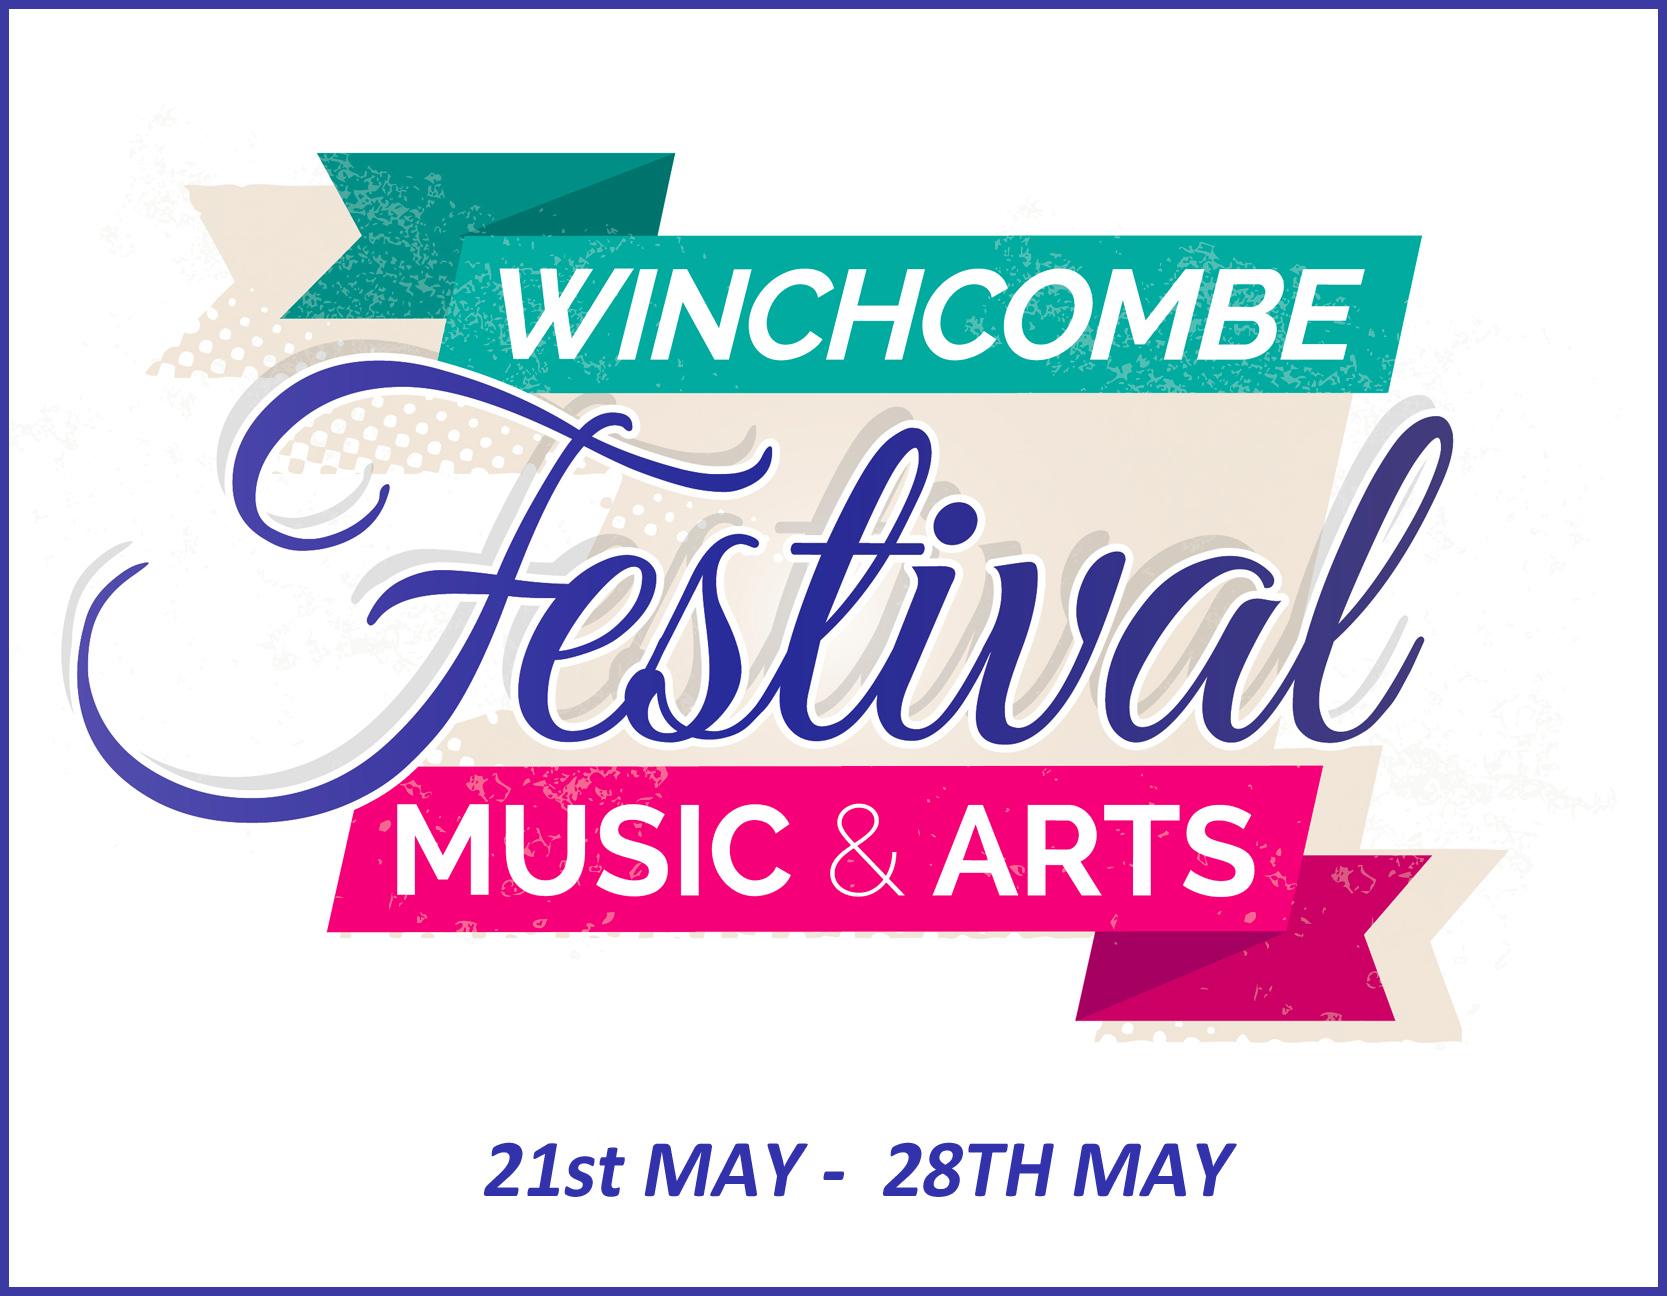 Winchcombe Festival of Music & Arts